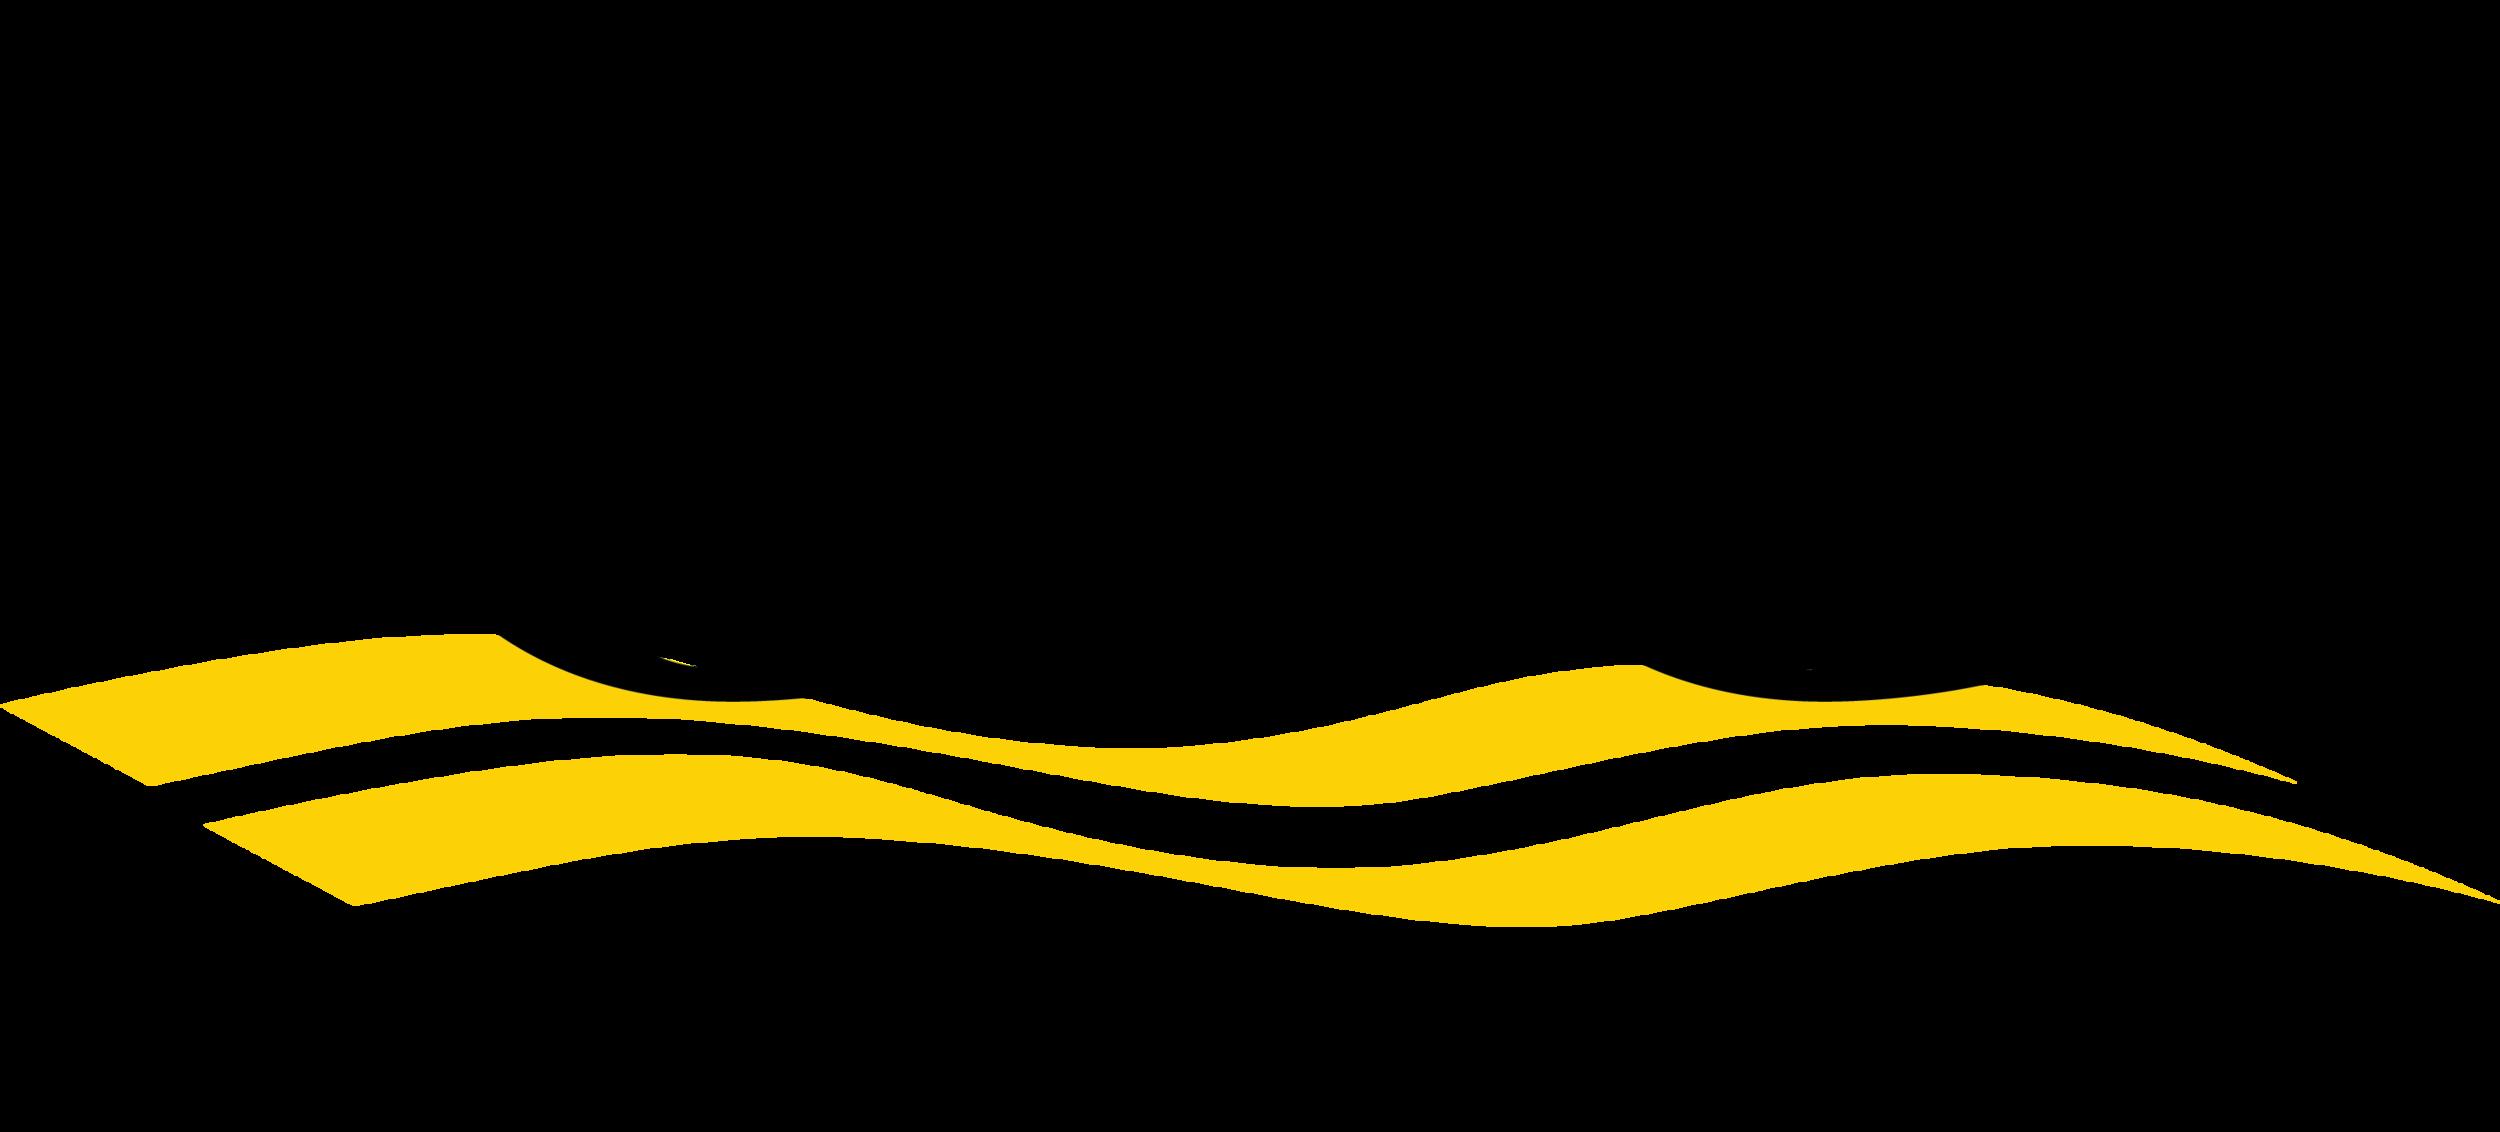 cbc-national-bank-logo-rgb.png